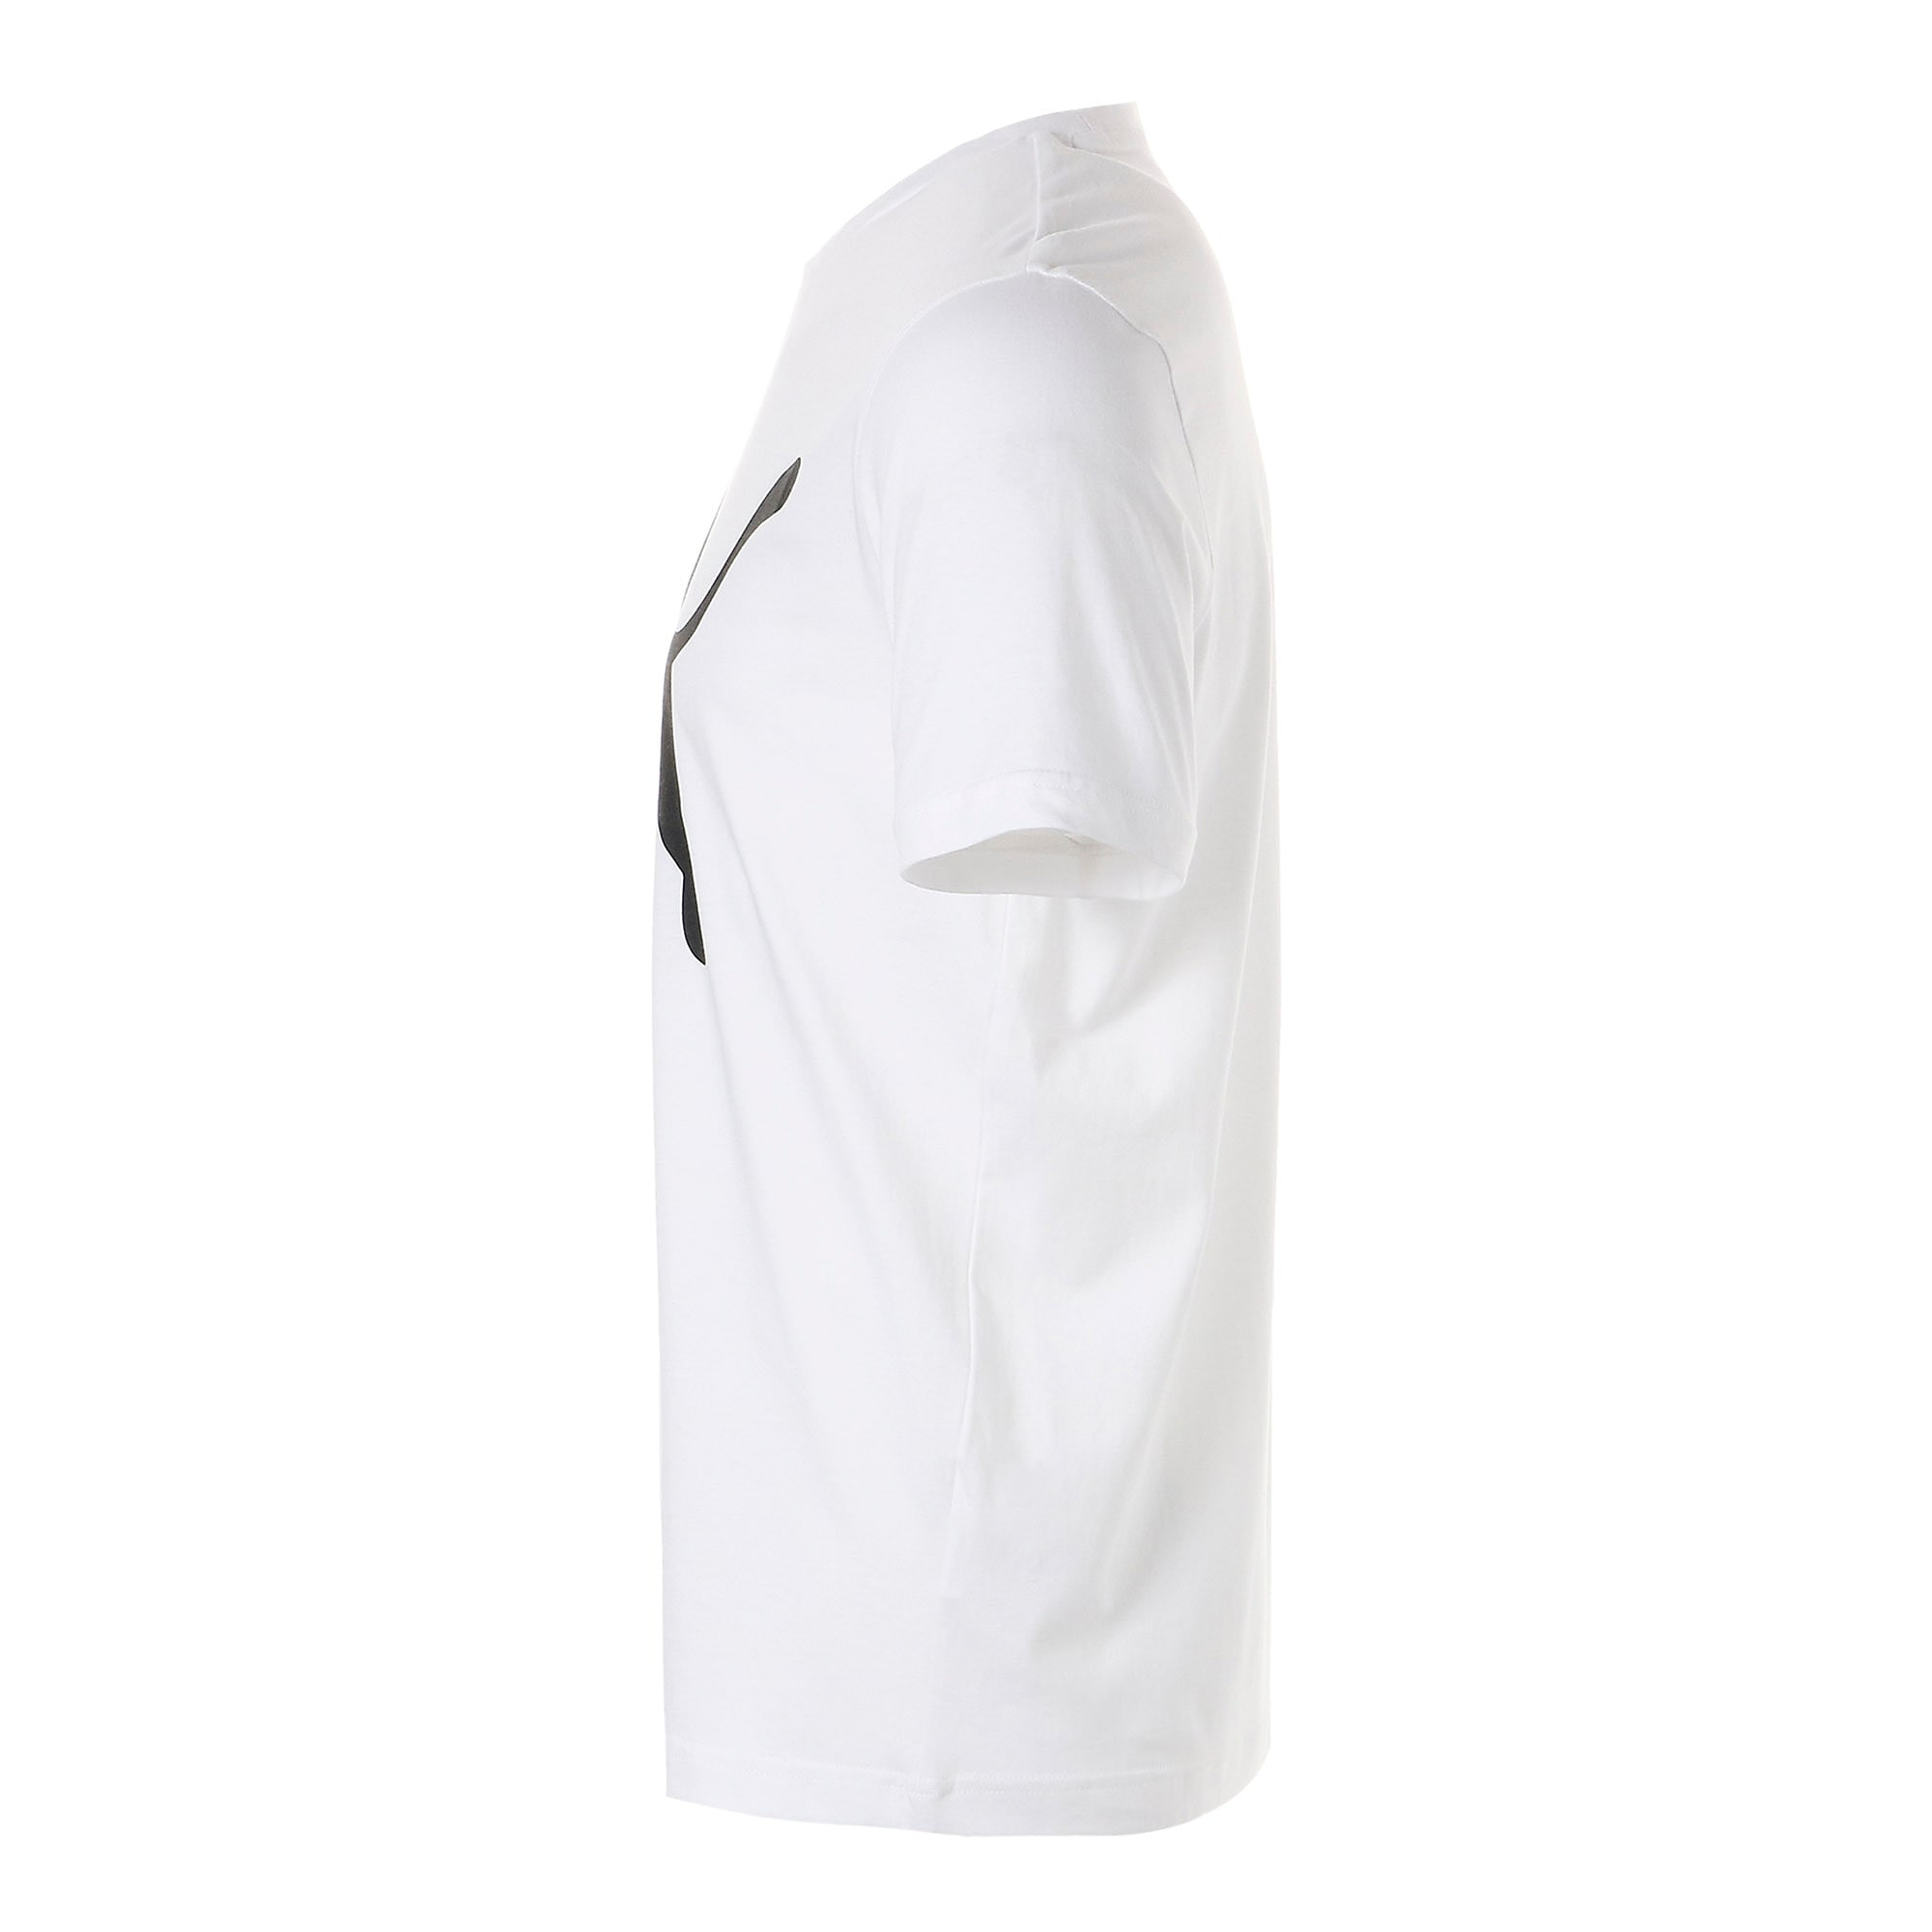 Thumbnail 5 of CLASSICS ロゴ SS Tシャツ 半袖, Puma White, medium-JPN